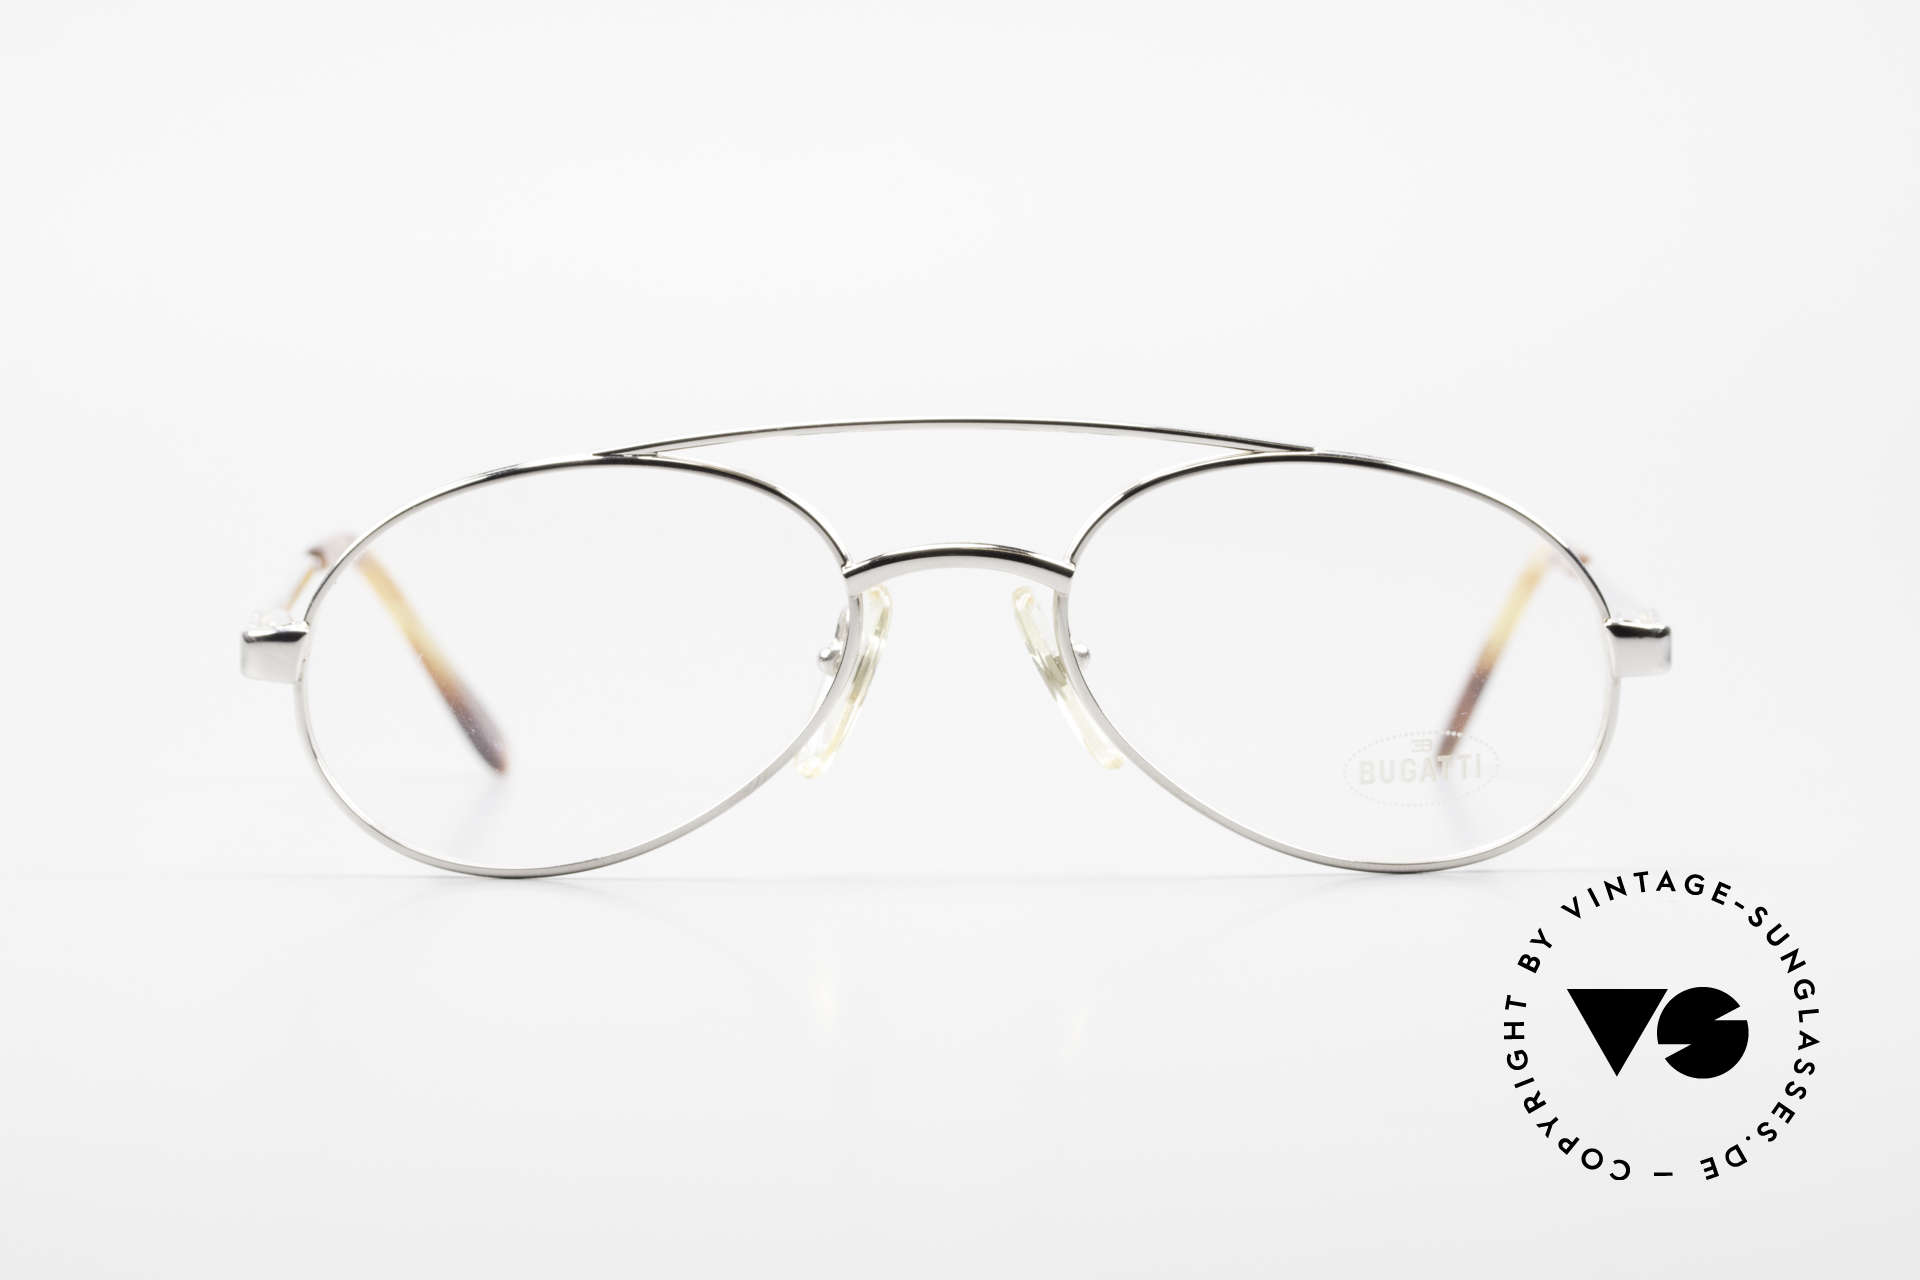 Bugatti 08104 Men's Vintage 80's Eyeglasses, chracteristic men's design by Bugatti (tear drop), Made for Men